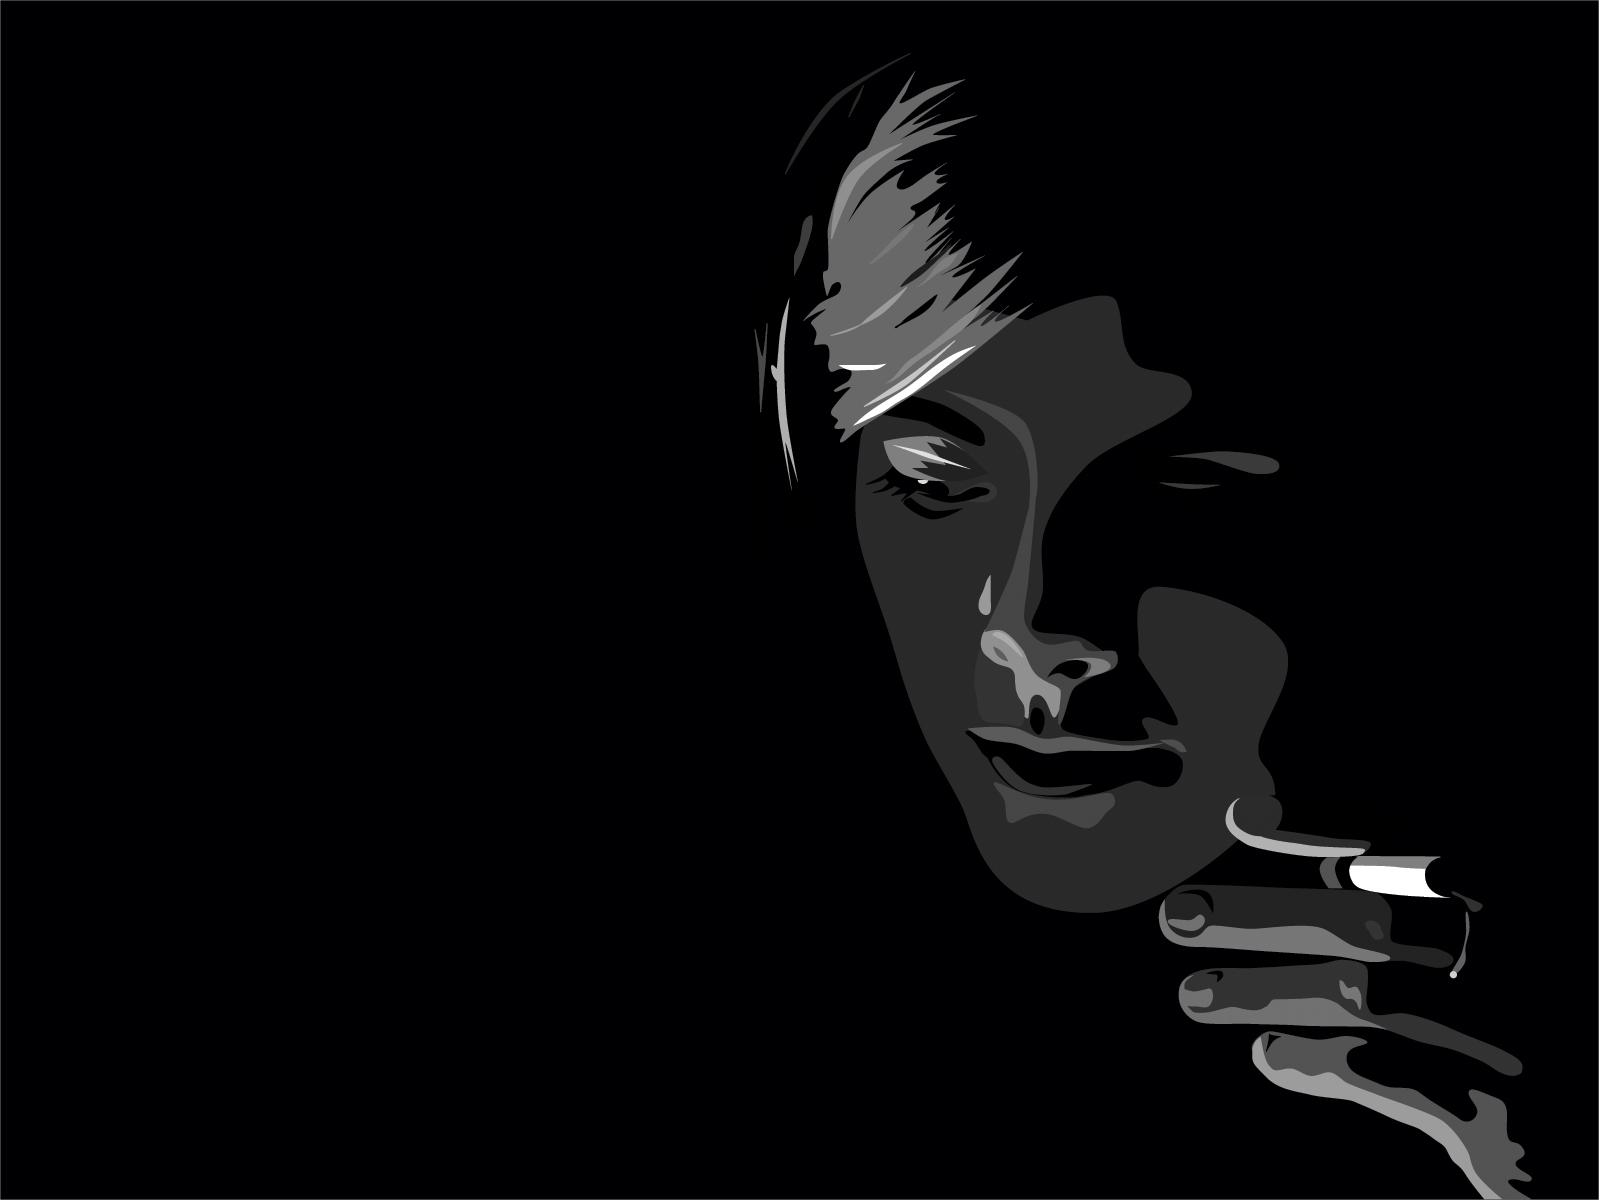 Wallpaper girl face shadow cigarette 1600x1200 749981 hd girl face shadow cigarette voltagebd Choice Image